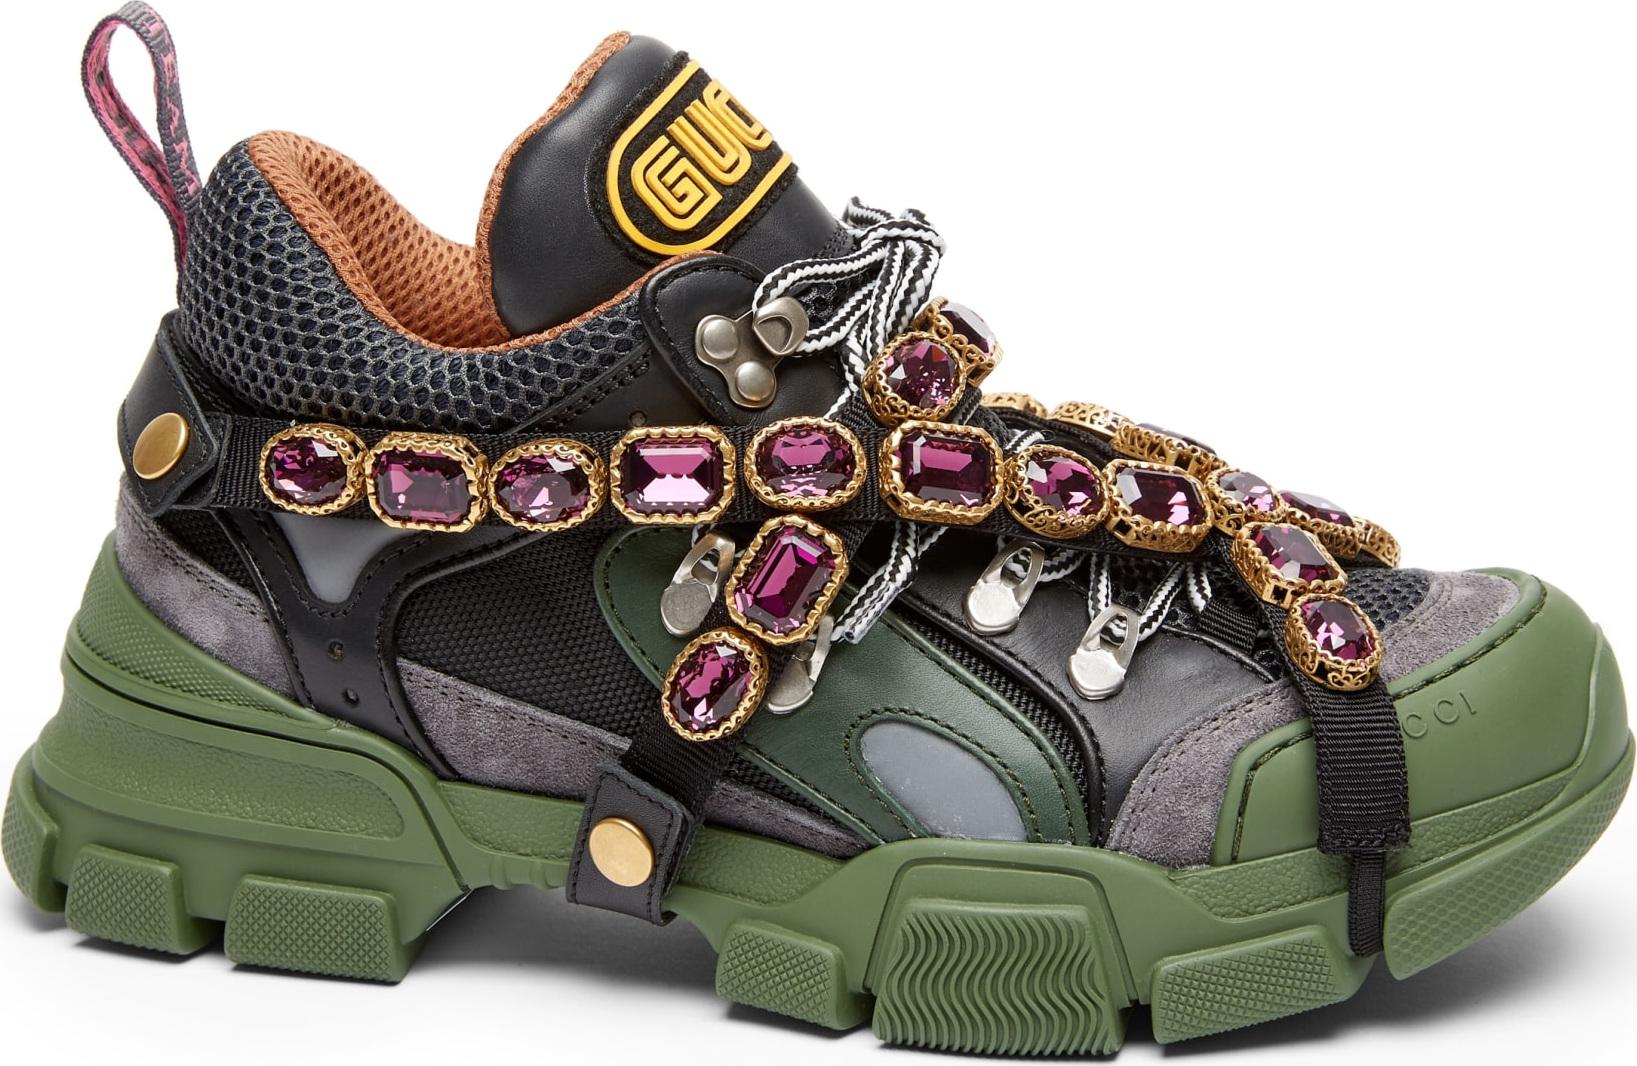 Gucci Flashtrek Jewel Sneaker In Grey Mkt Flash  Olivia Sneakers